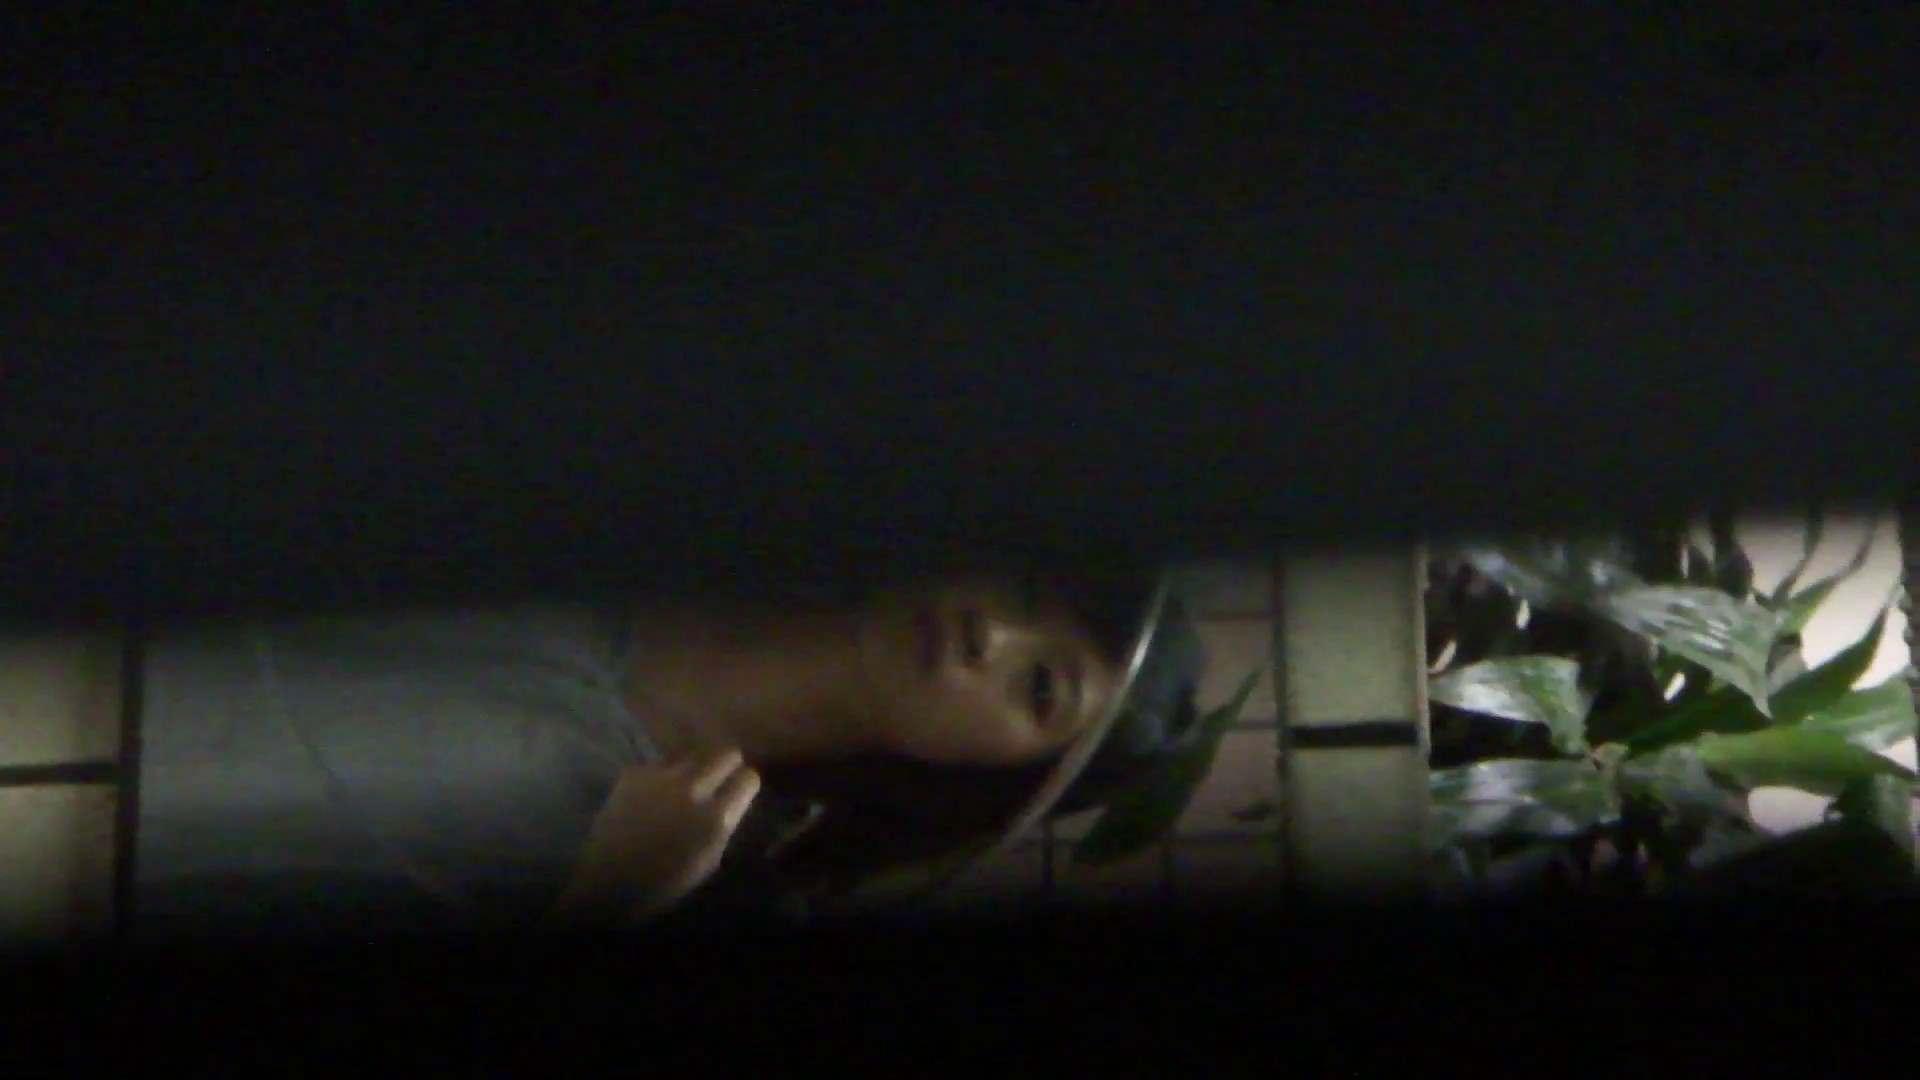 JD盗撮 美女の洗面所の秘密 Vol.76 美女のボディ エロ画像 64PIX 53